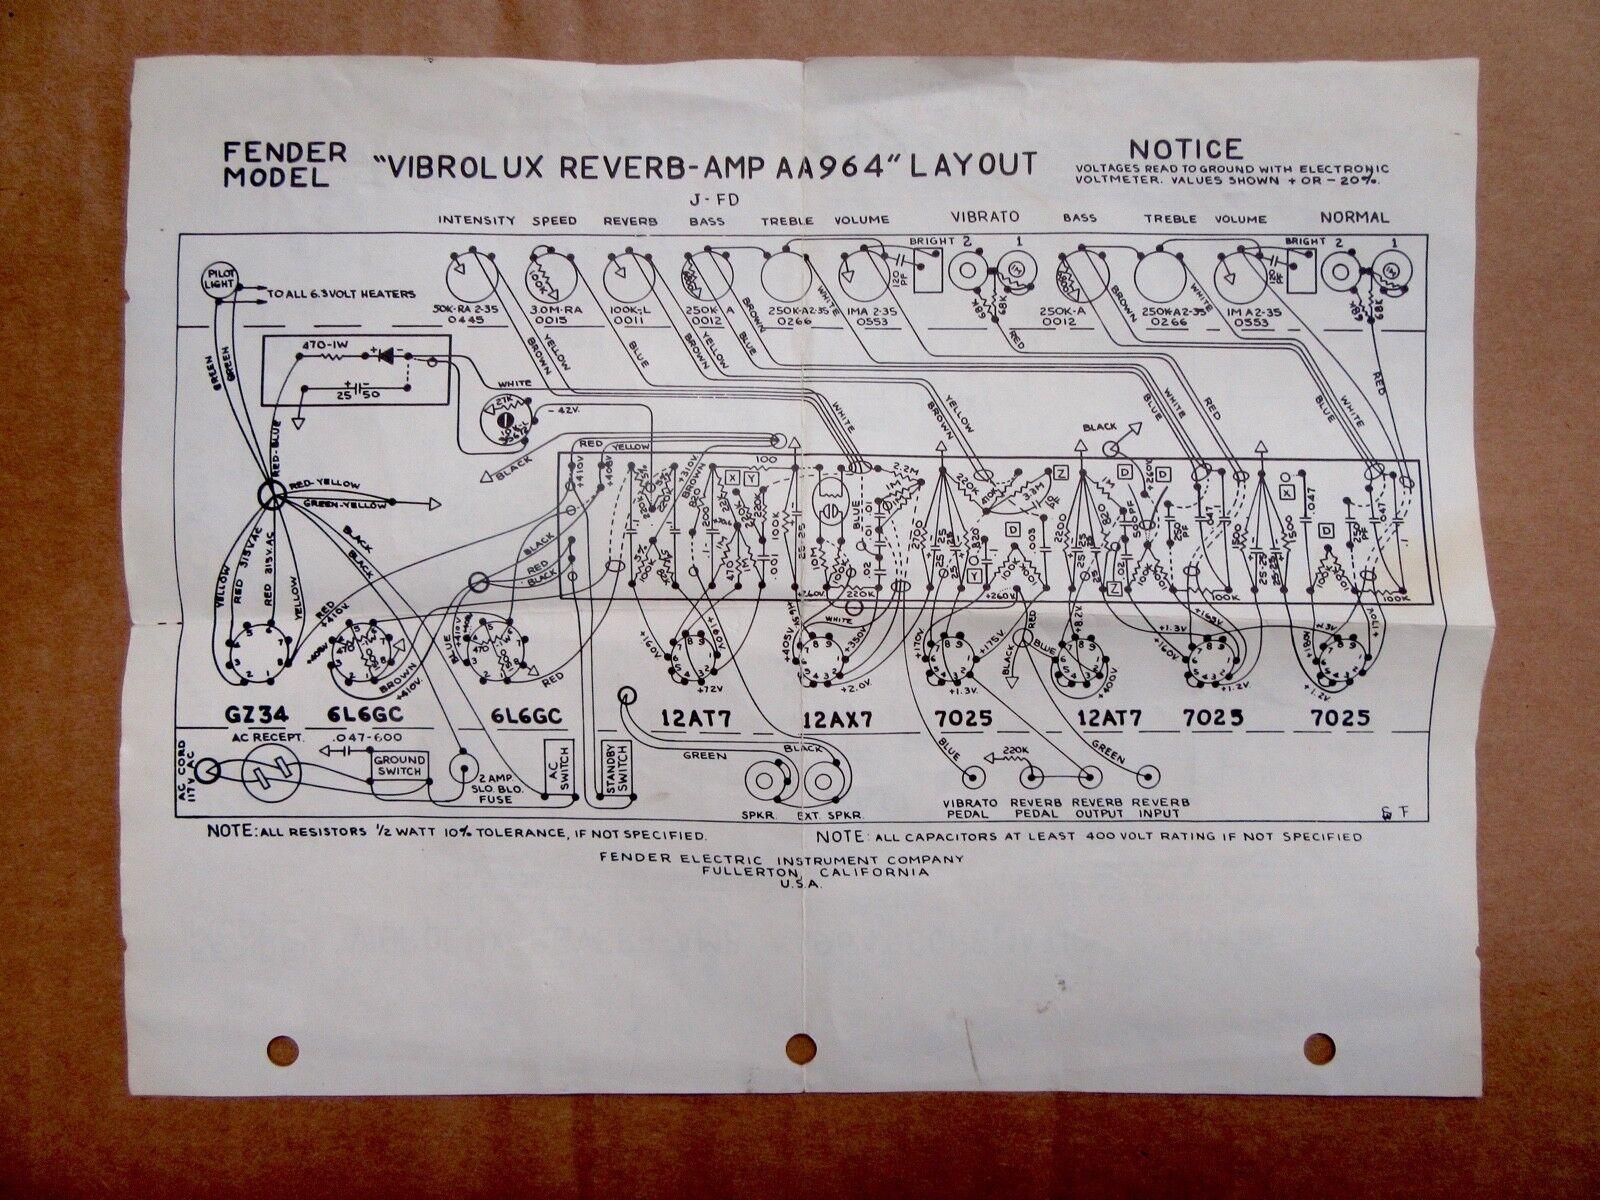 1963 - 1968 Fender Vibrolux Reverb AA964 Schematic